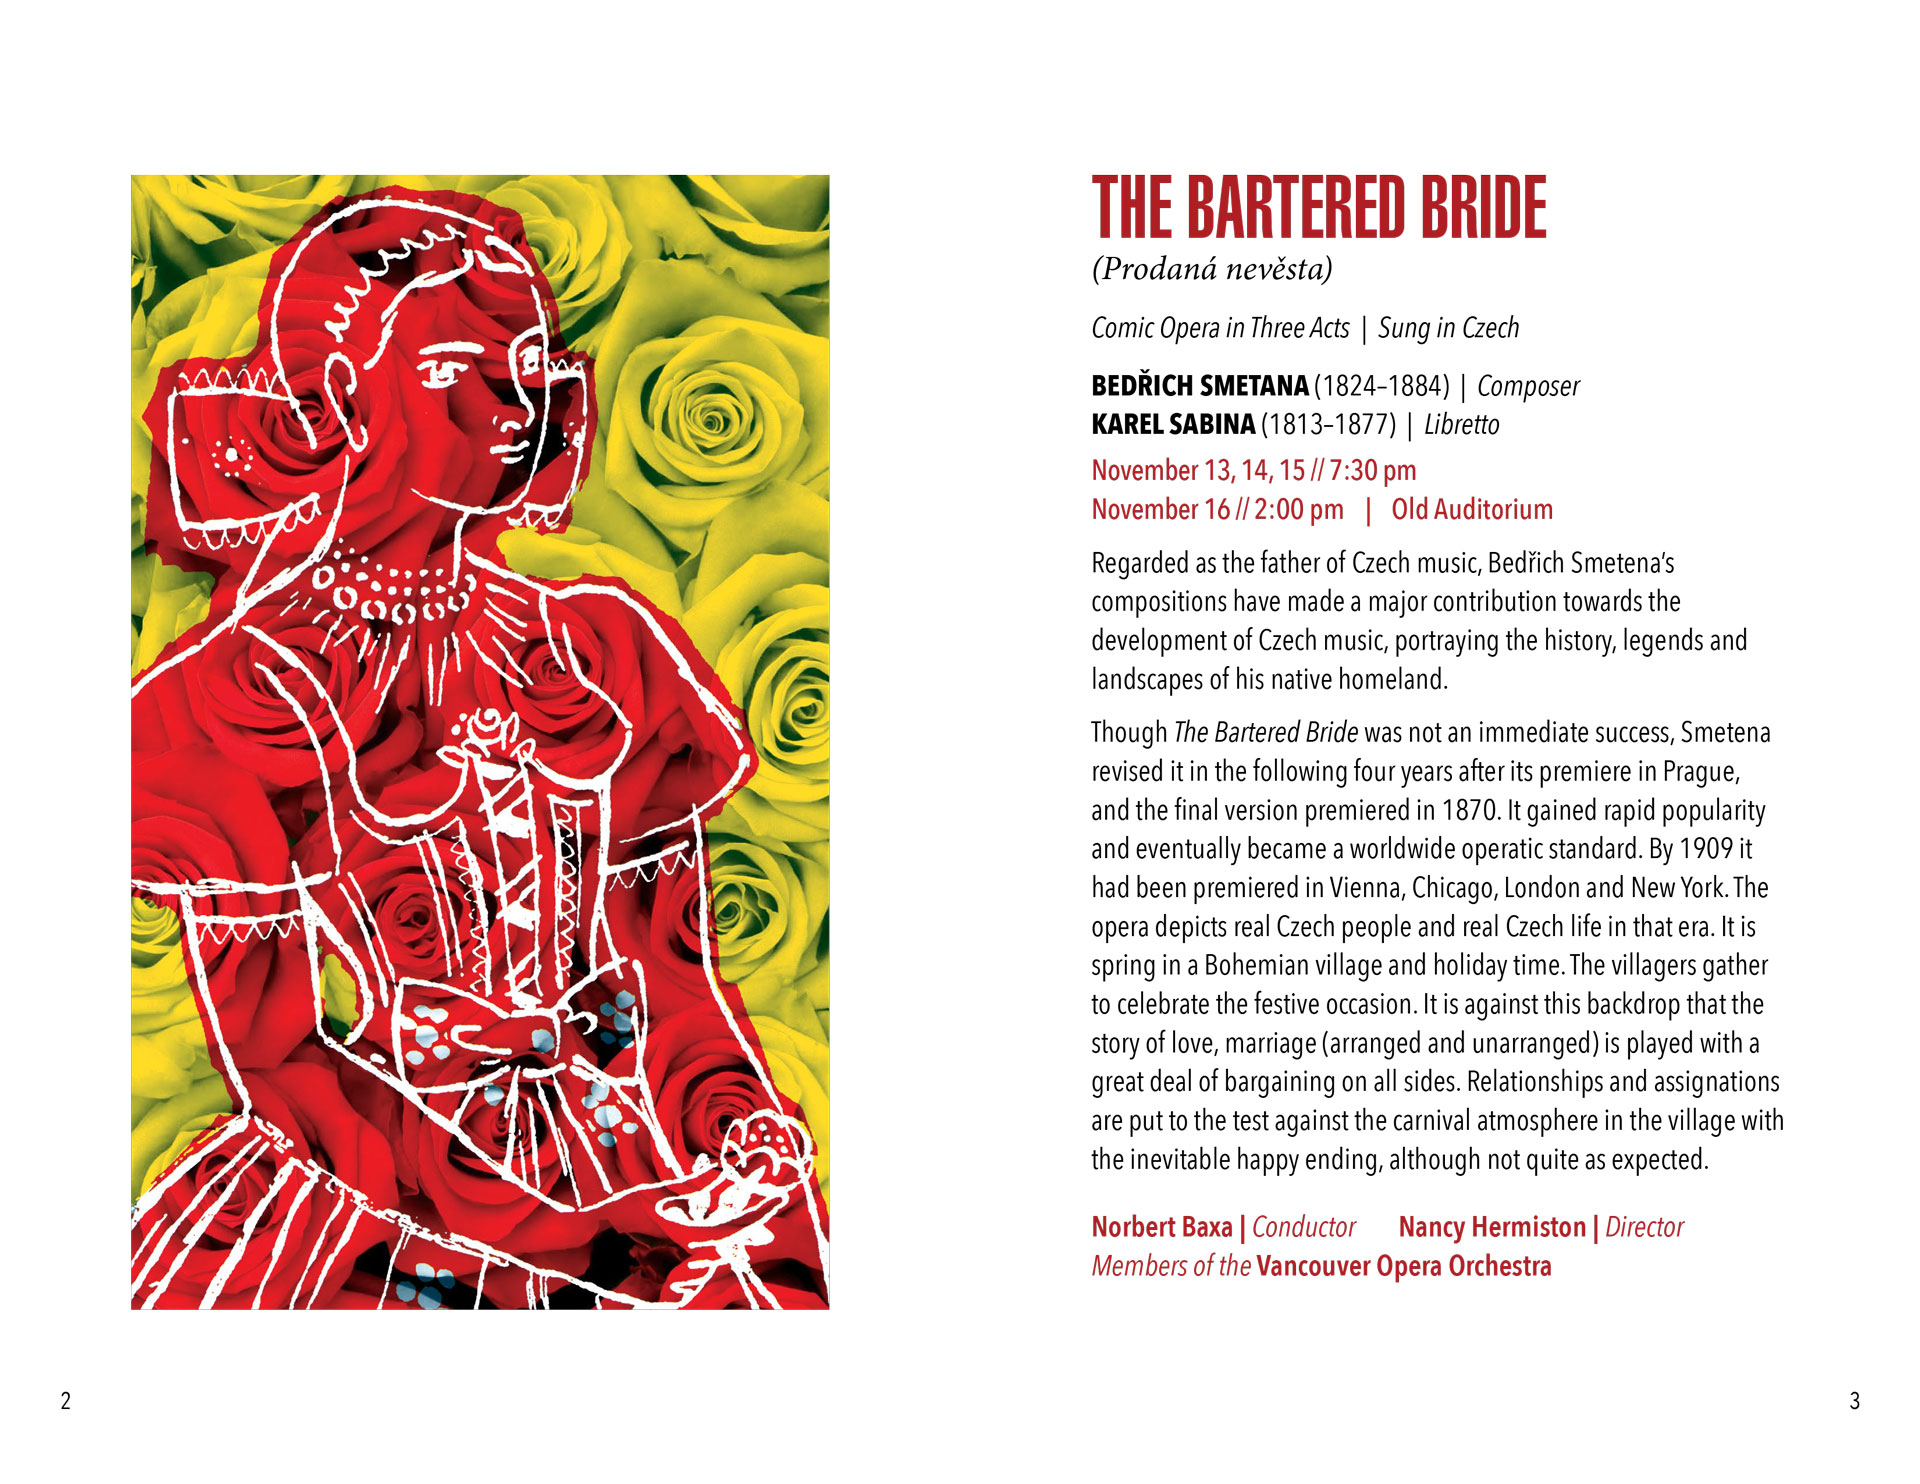 programme book spread for Smetana opera The Bartered Bride